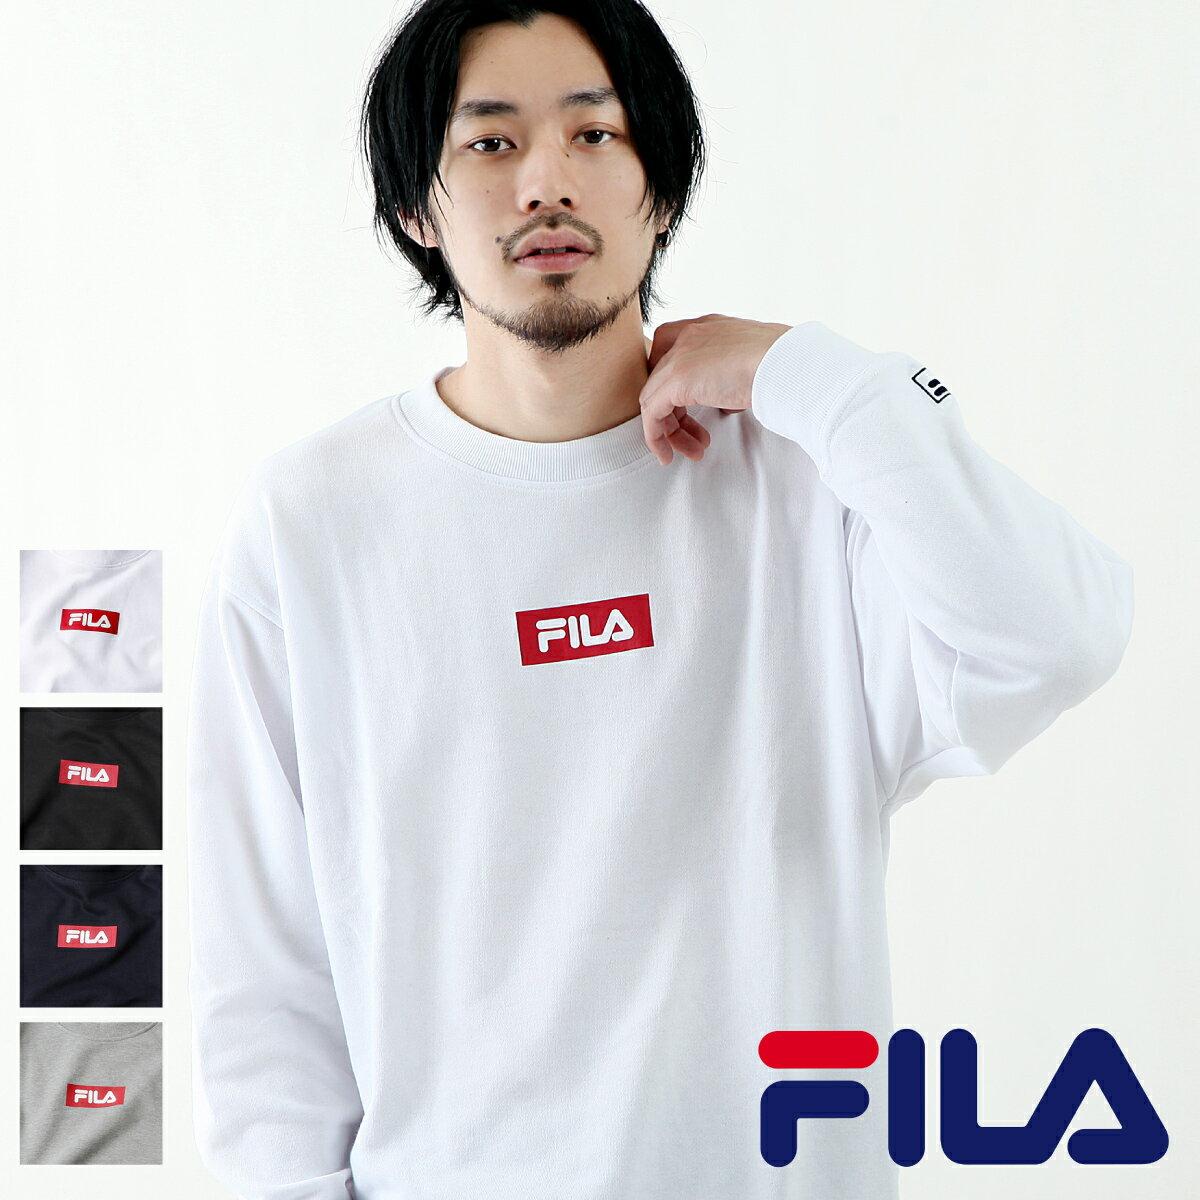 【FILA】方格LOGO運動衫 0